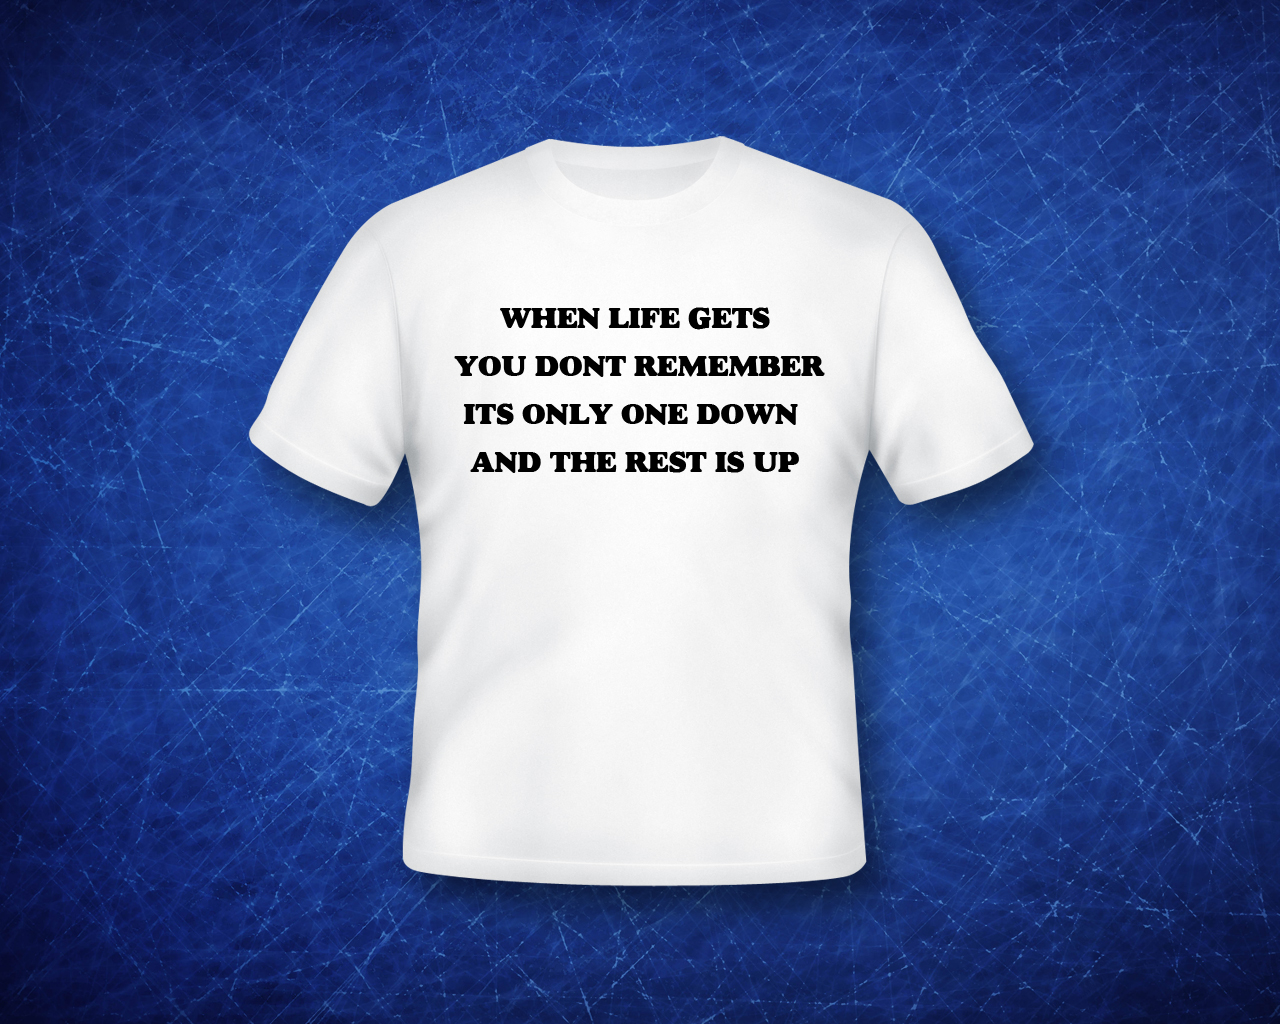 Разработка дизайна футболок  фото f_0005ba128782e90a.jpg